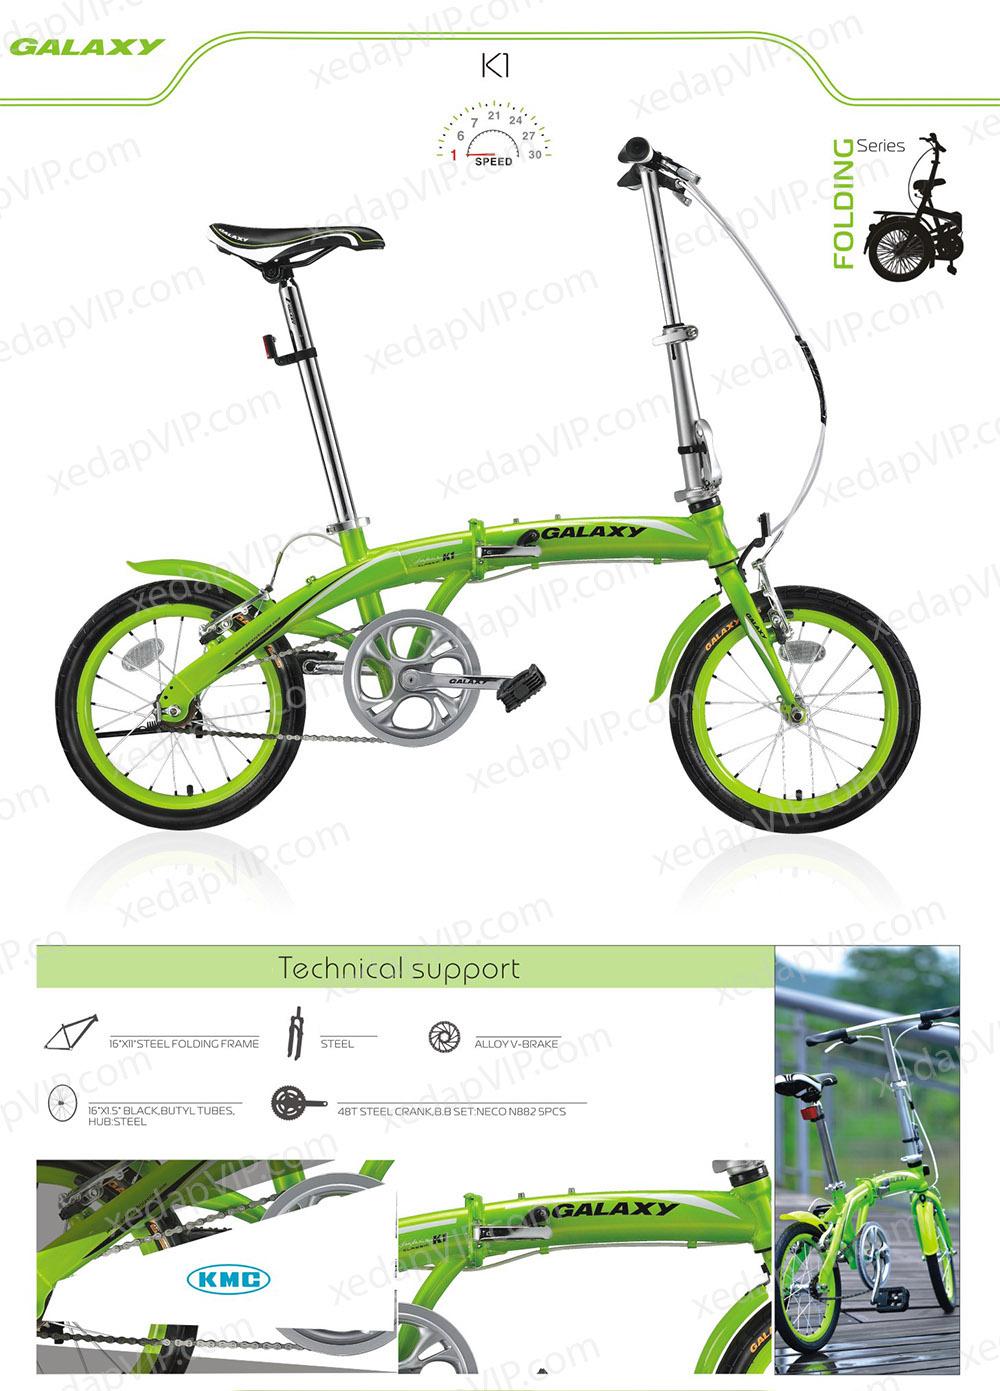 Xe dap the thao Gap GALAXY K1, xe dap the thao, xe dap trinx, xe đạp thể thao chính hãng, xe dap asama, k1